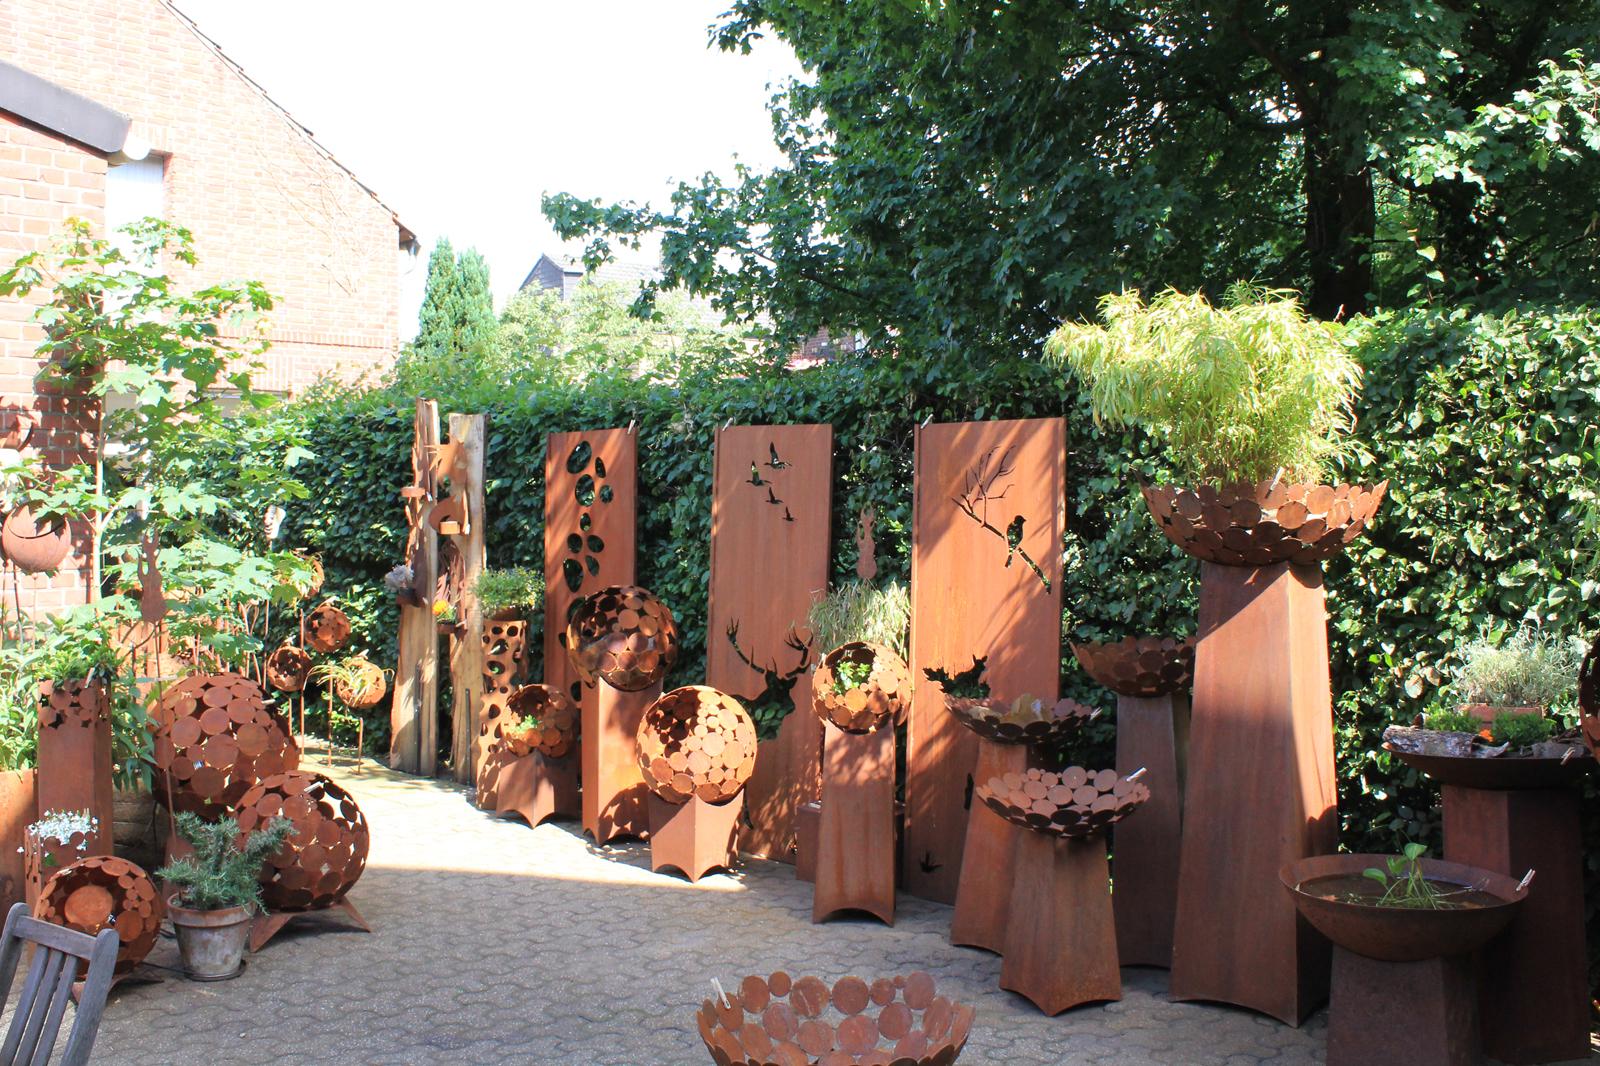 Atelier 51 Gemeinschaftsatelier Fur Kunst Design